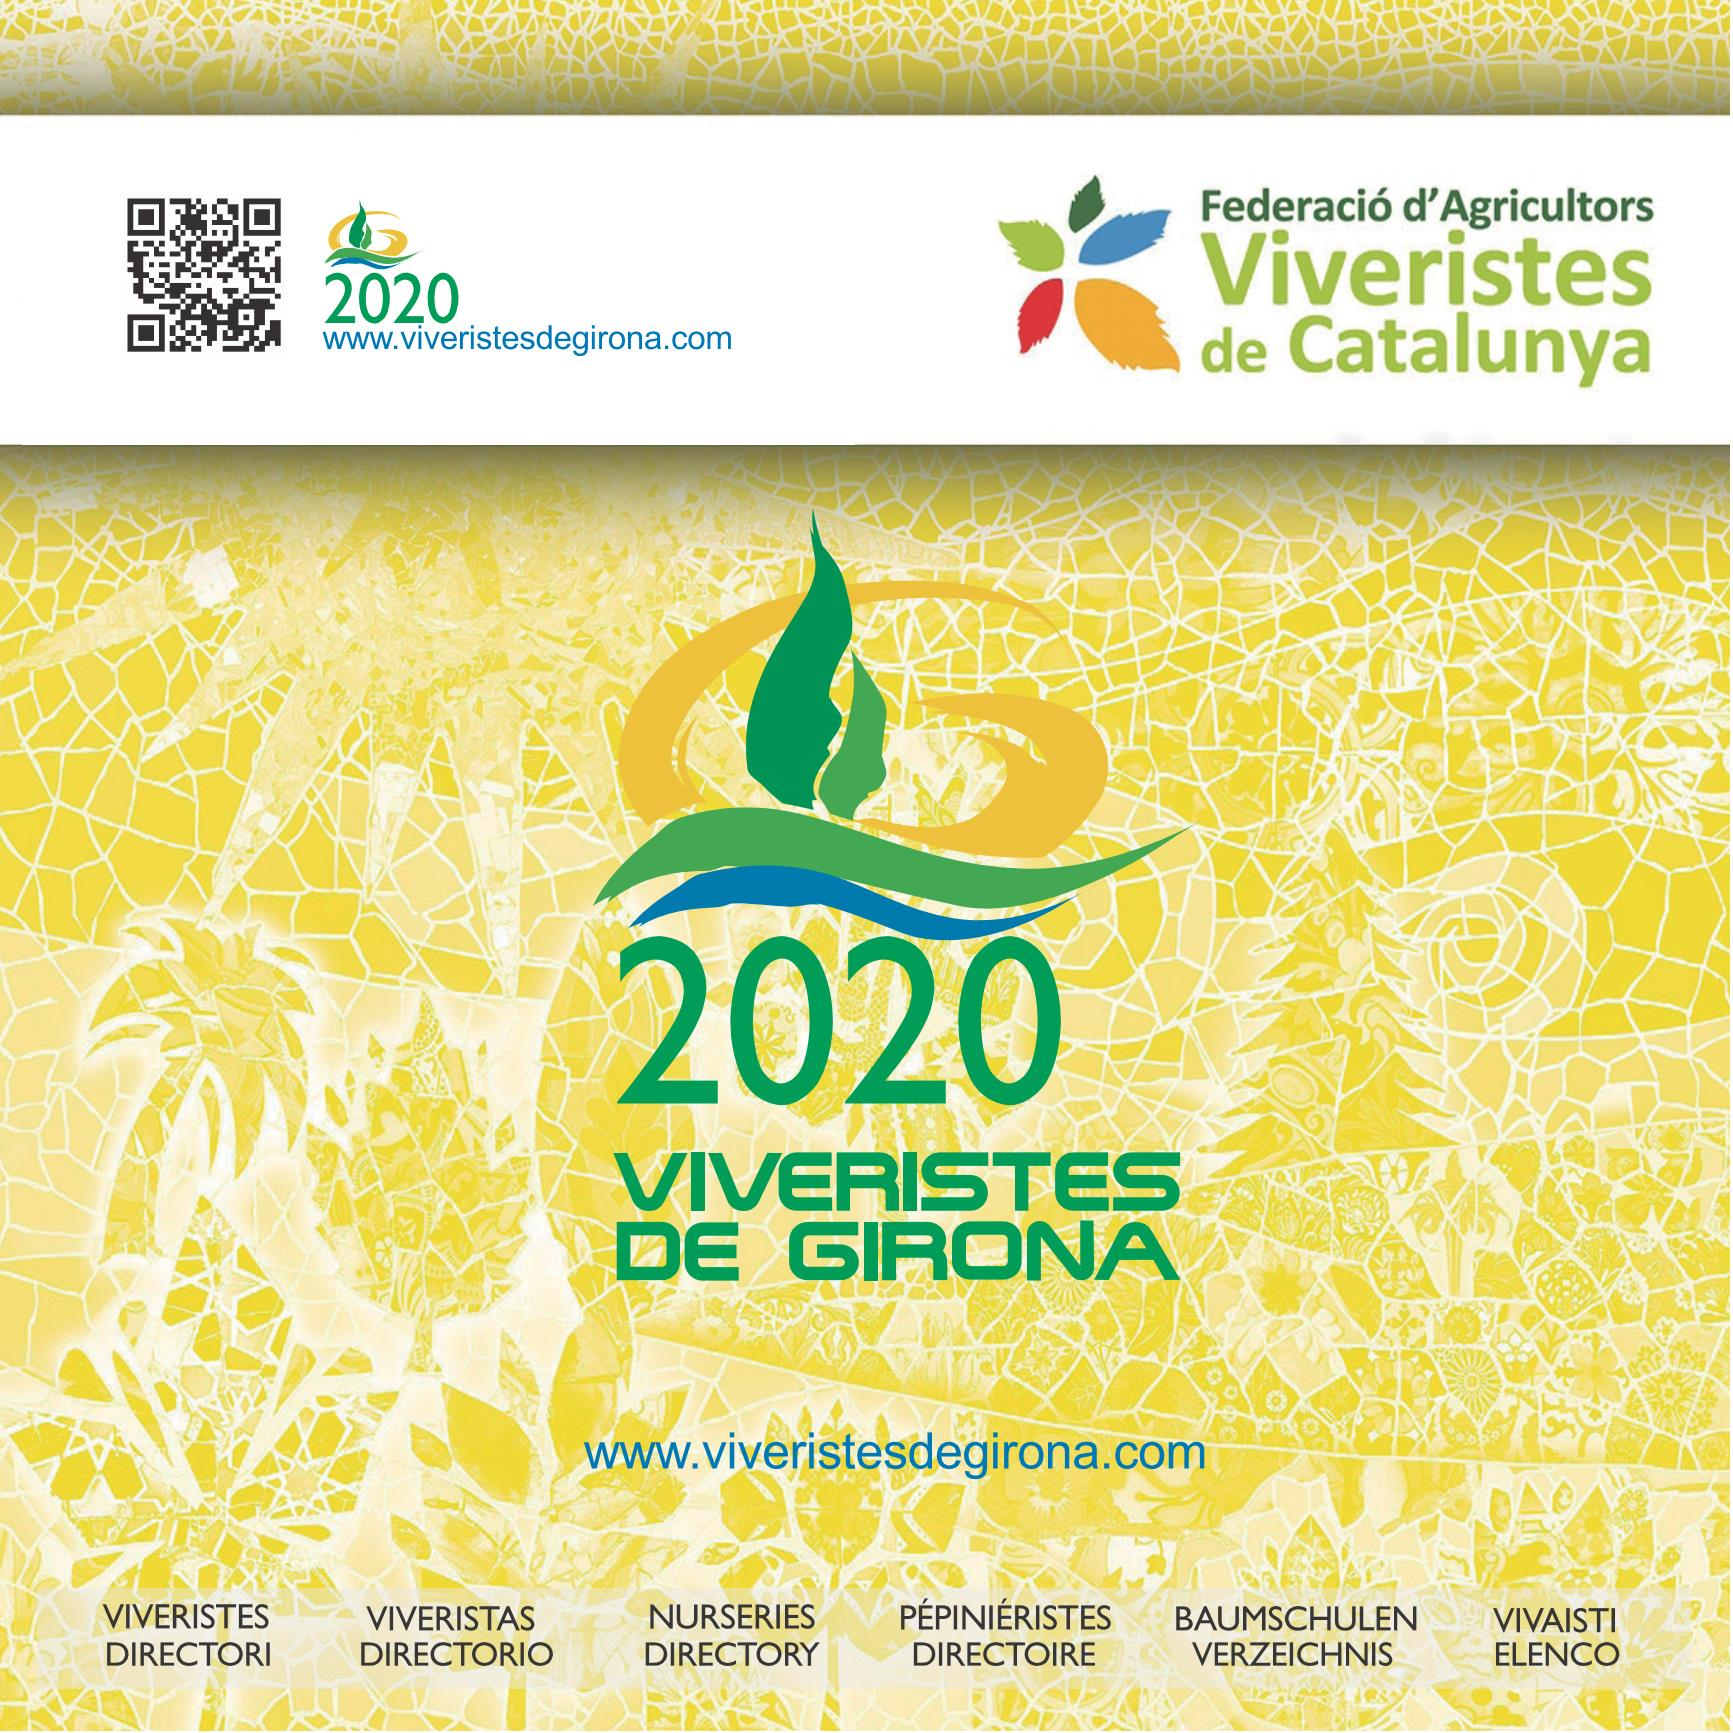 GIRONA-nurseries-vivers-2020.jpeg